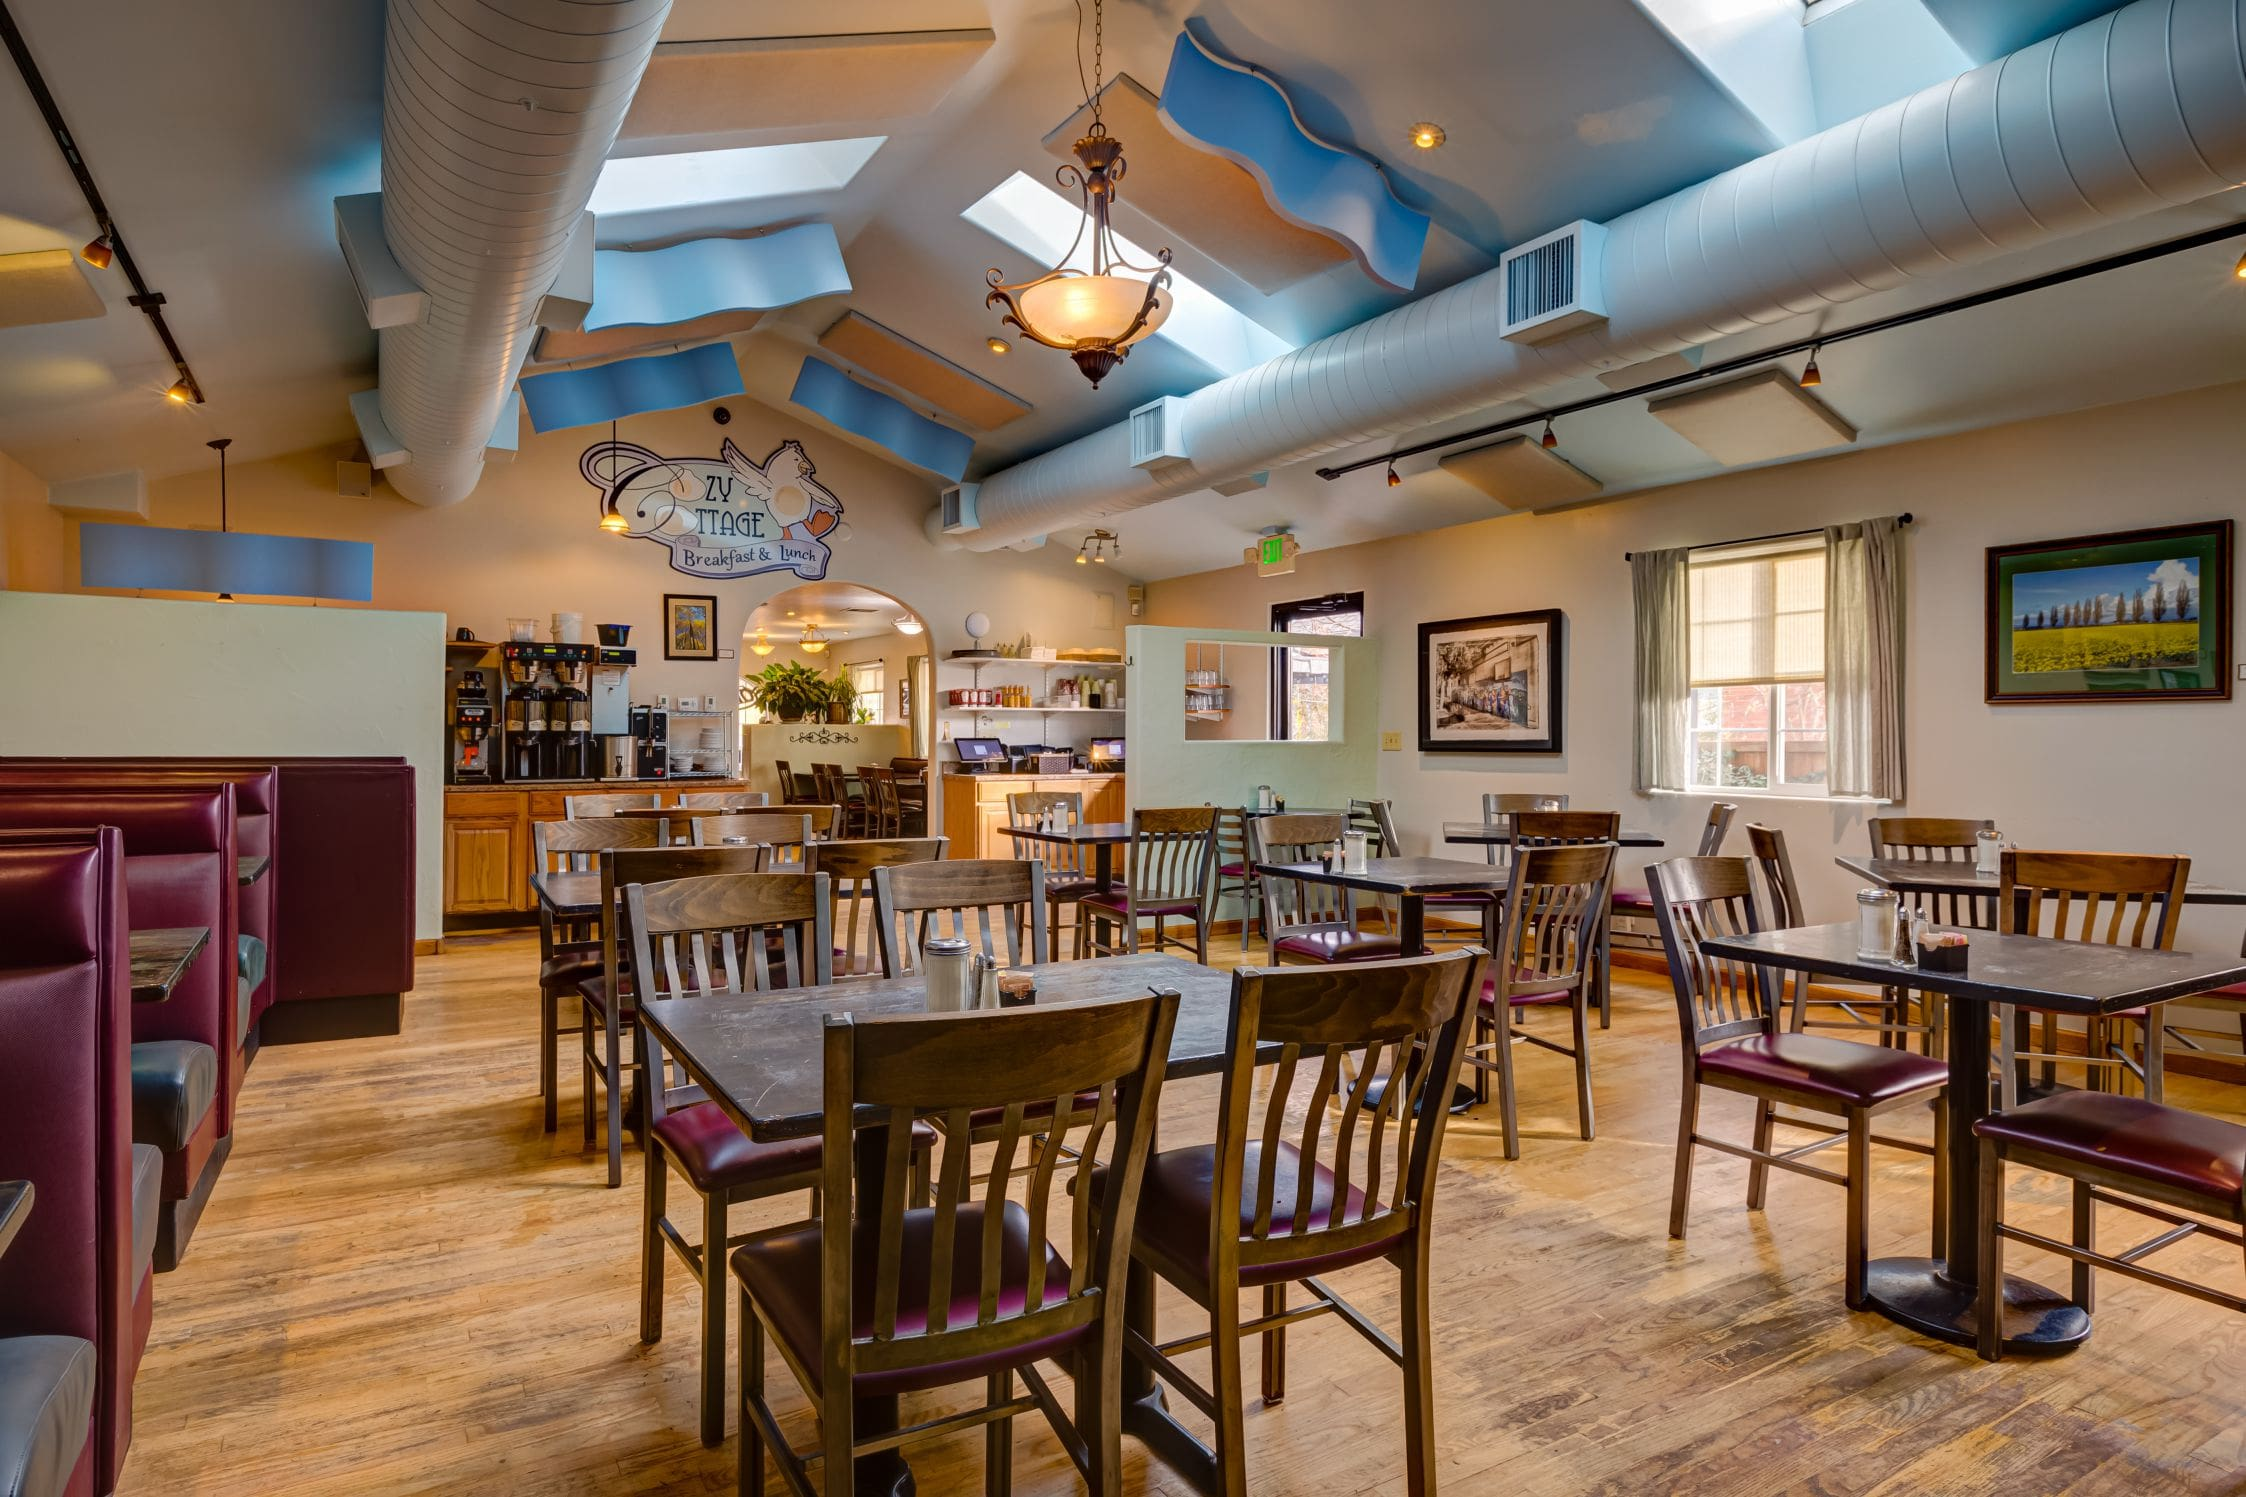 Cozy-Cottage-Restaurant-Denver-0005-min